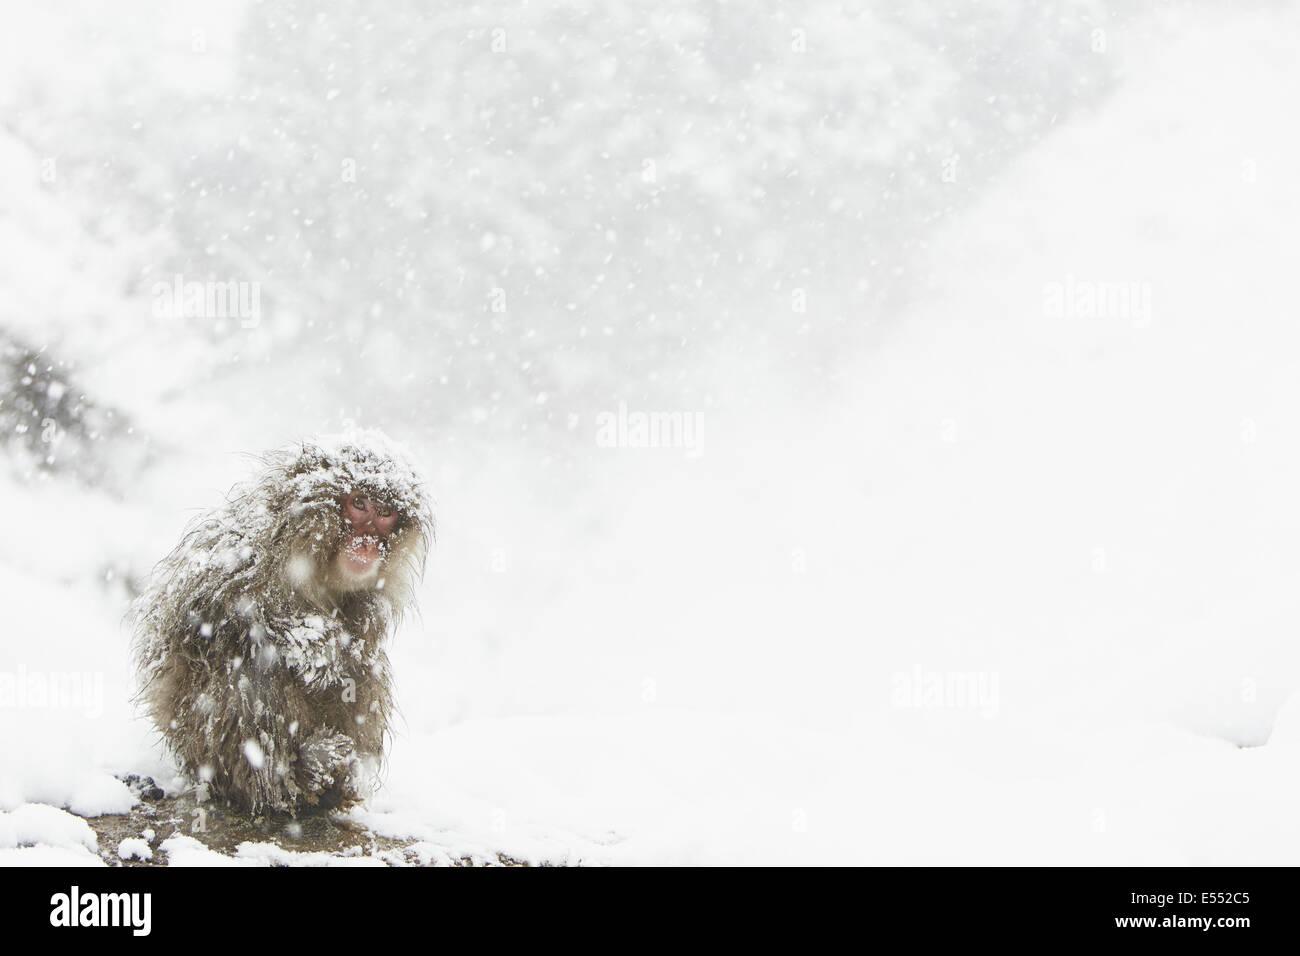 Japanese Macaque (Macaca fuscata) adult, huddled up during heavy snowfall, near Nagano, Honshu, Japan, February Stock Photo